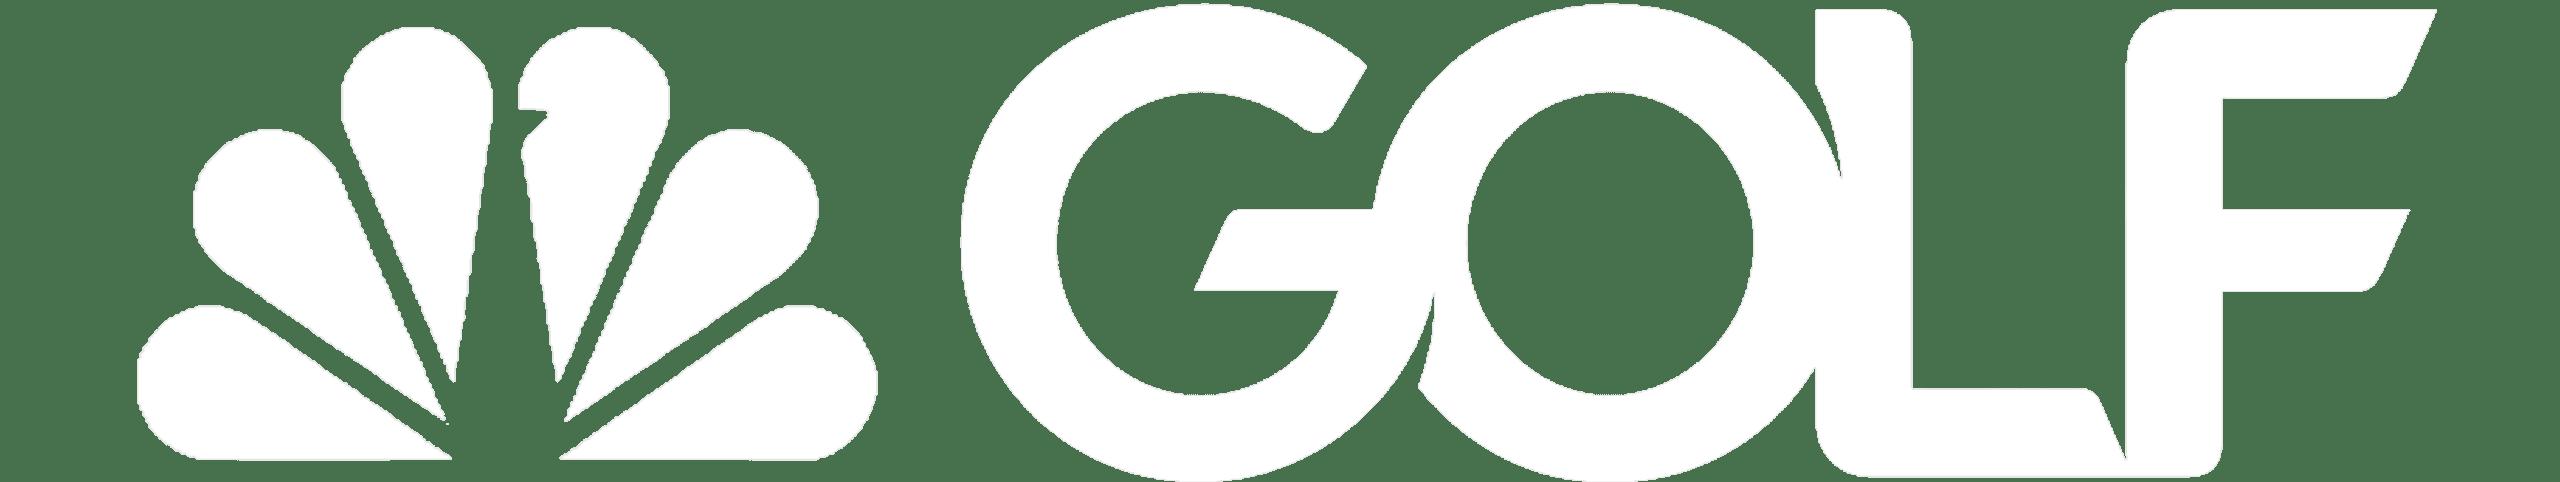 White Golf PNG Logo